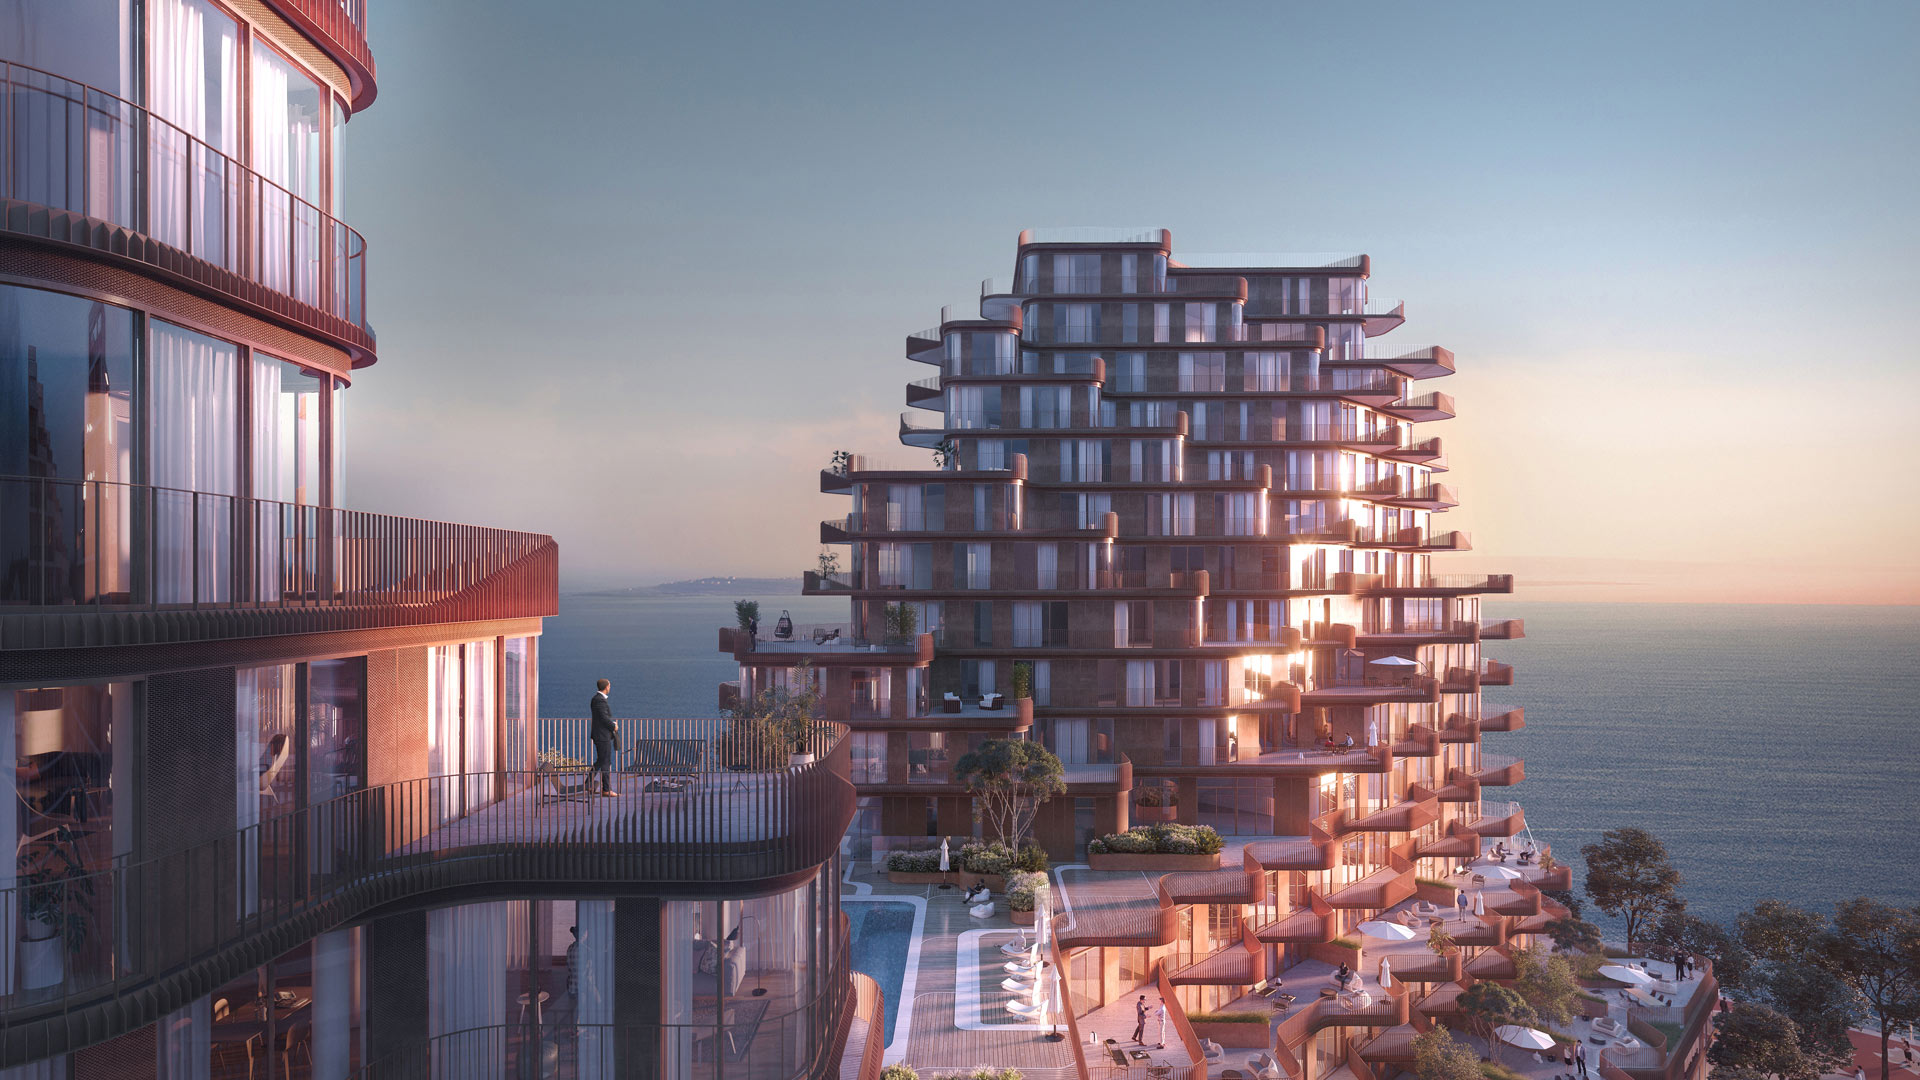 qualuna features balconies, terraces, opulent design, and first-class amenities